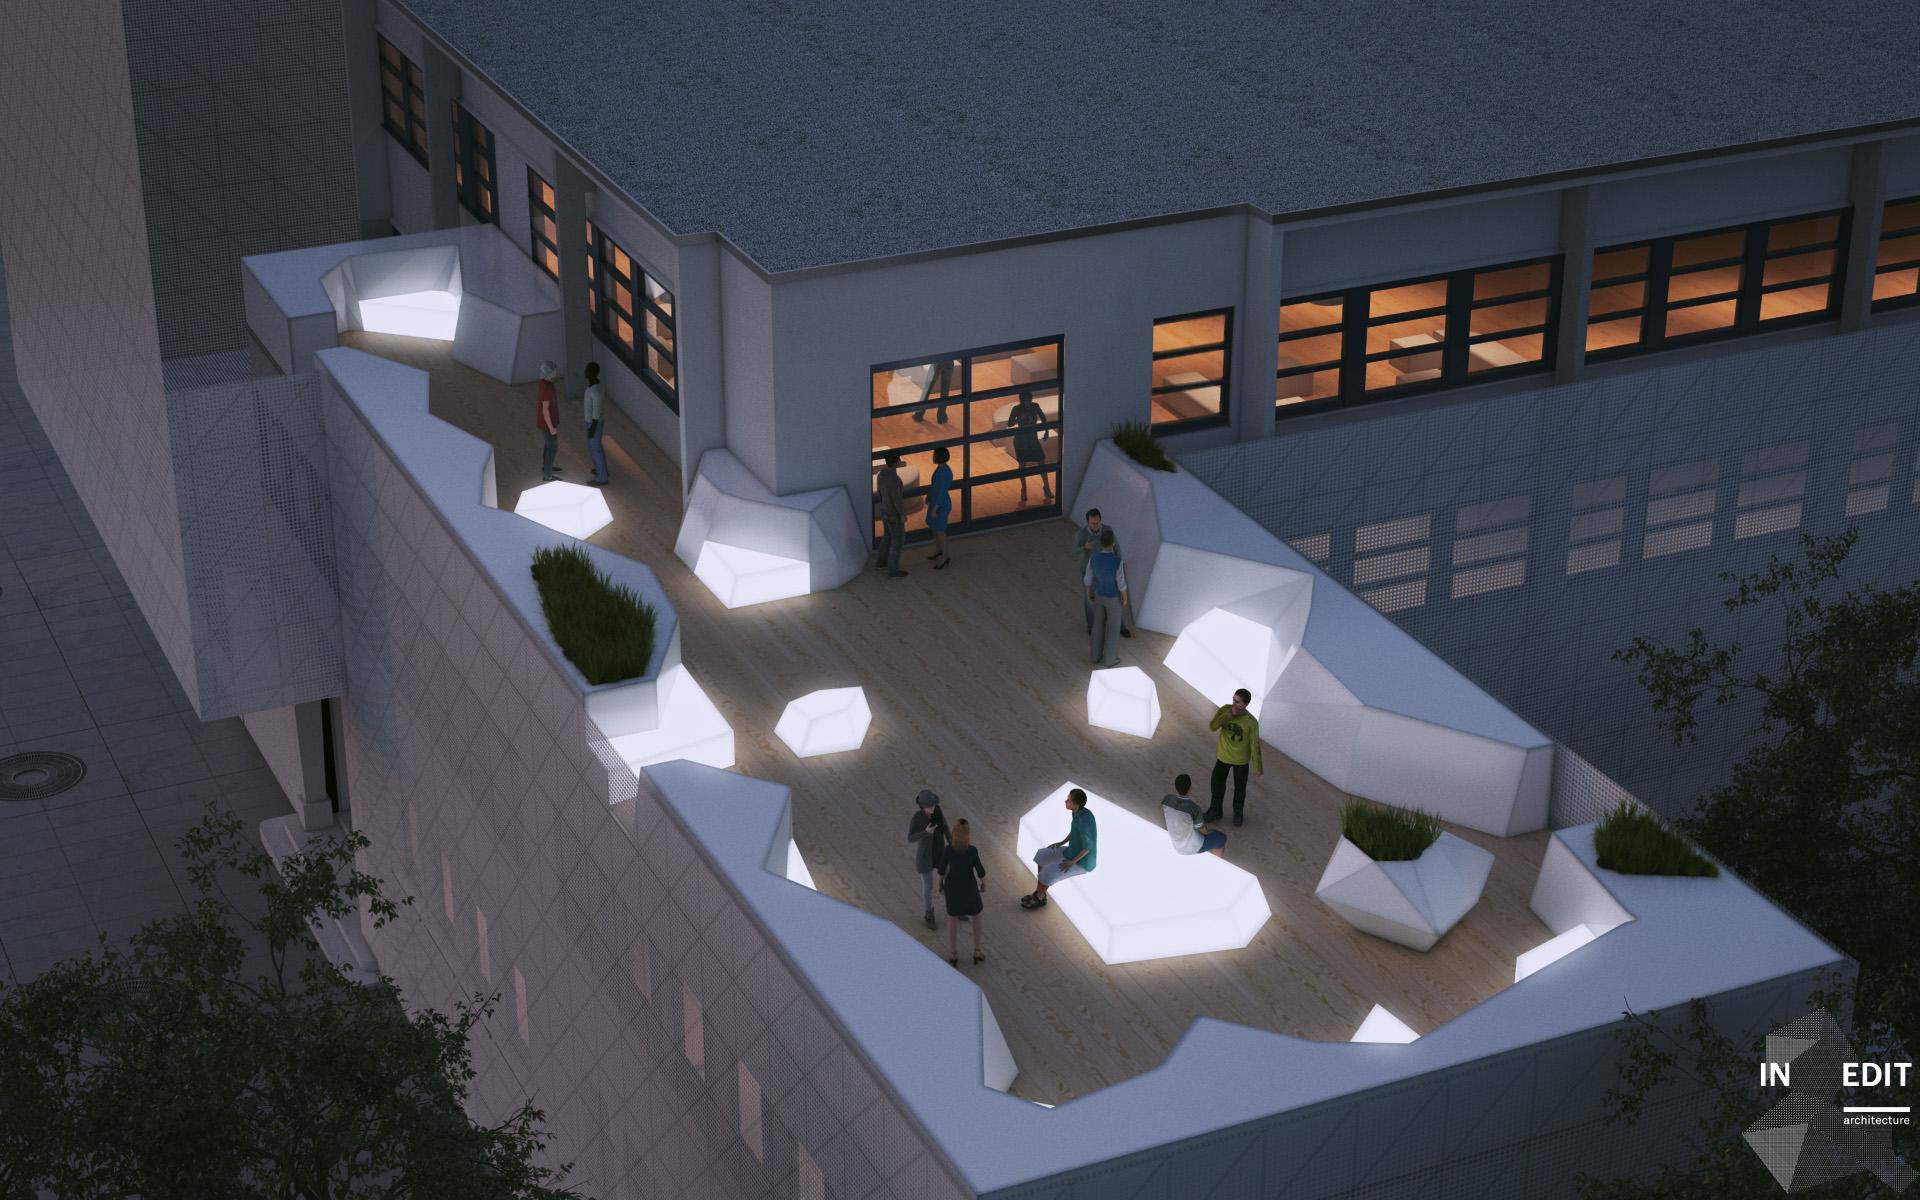 The New Development School in France by Xavier Niel